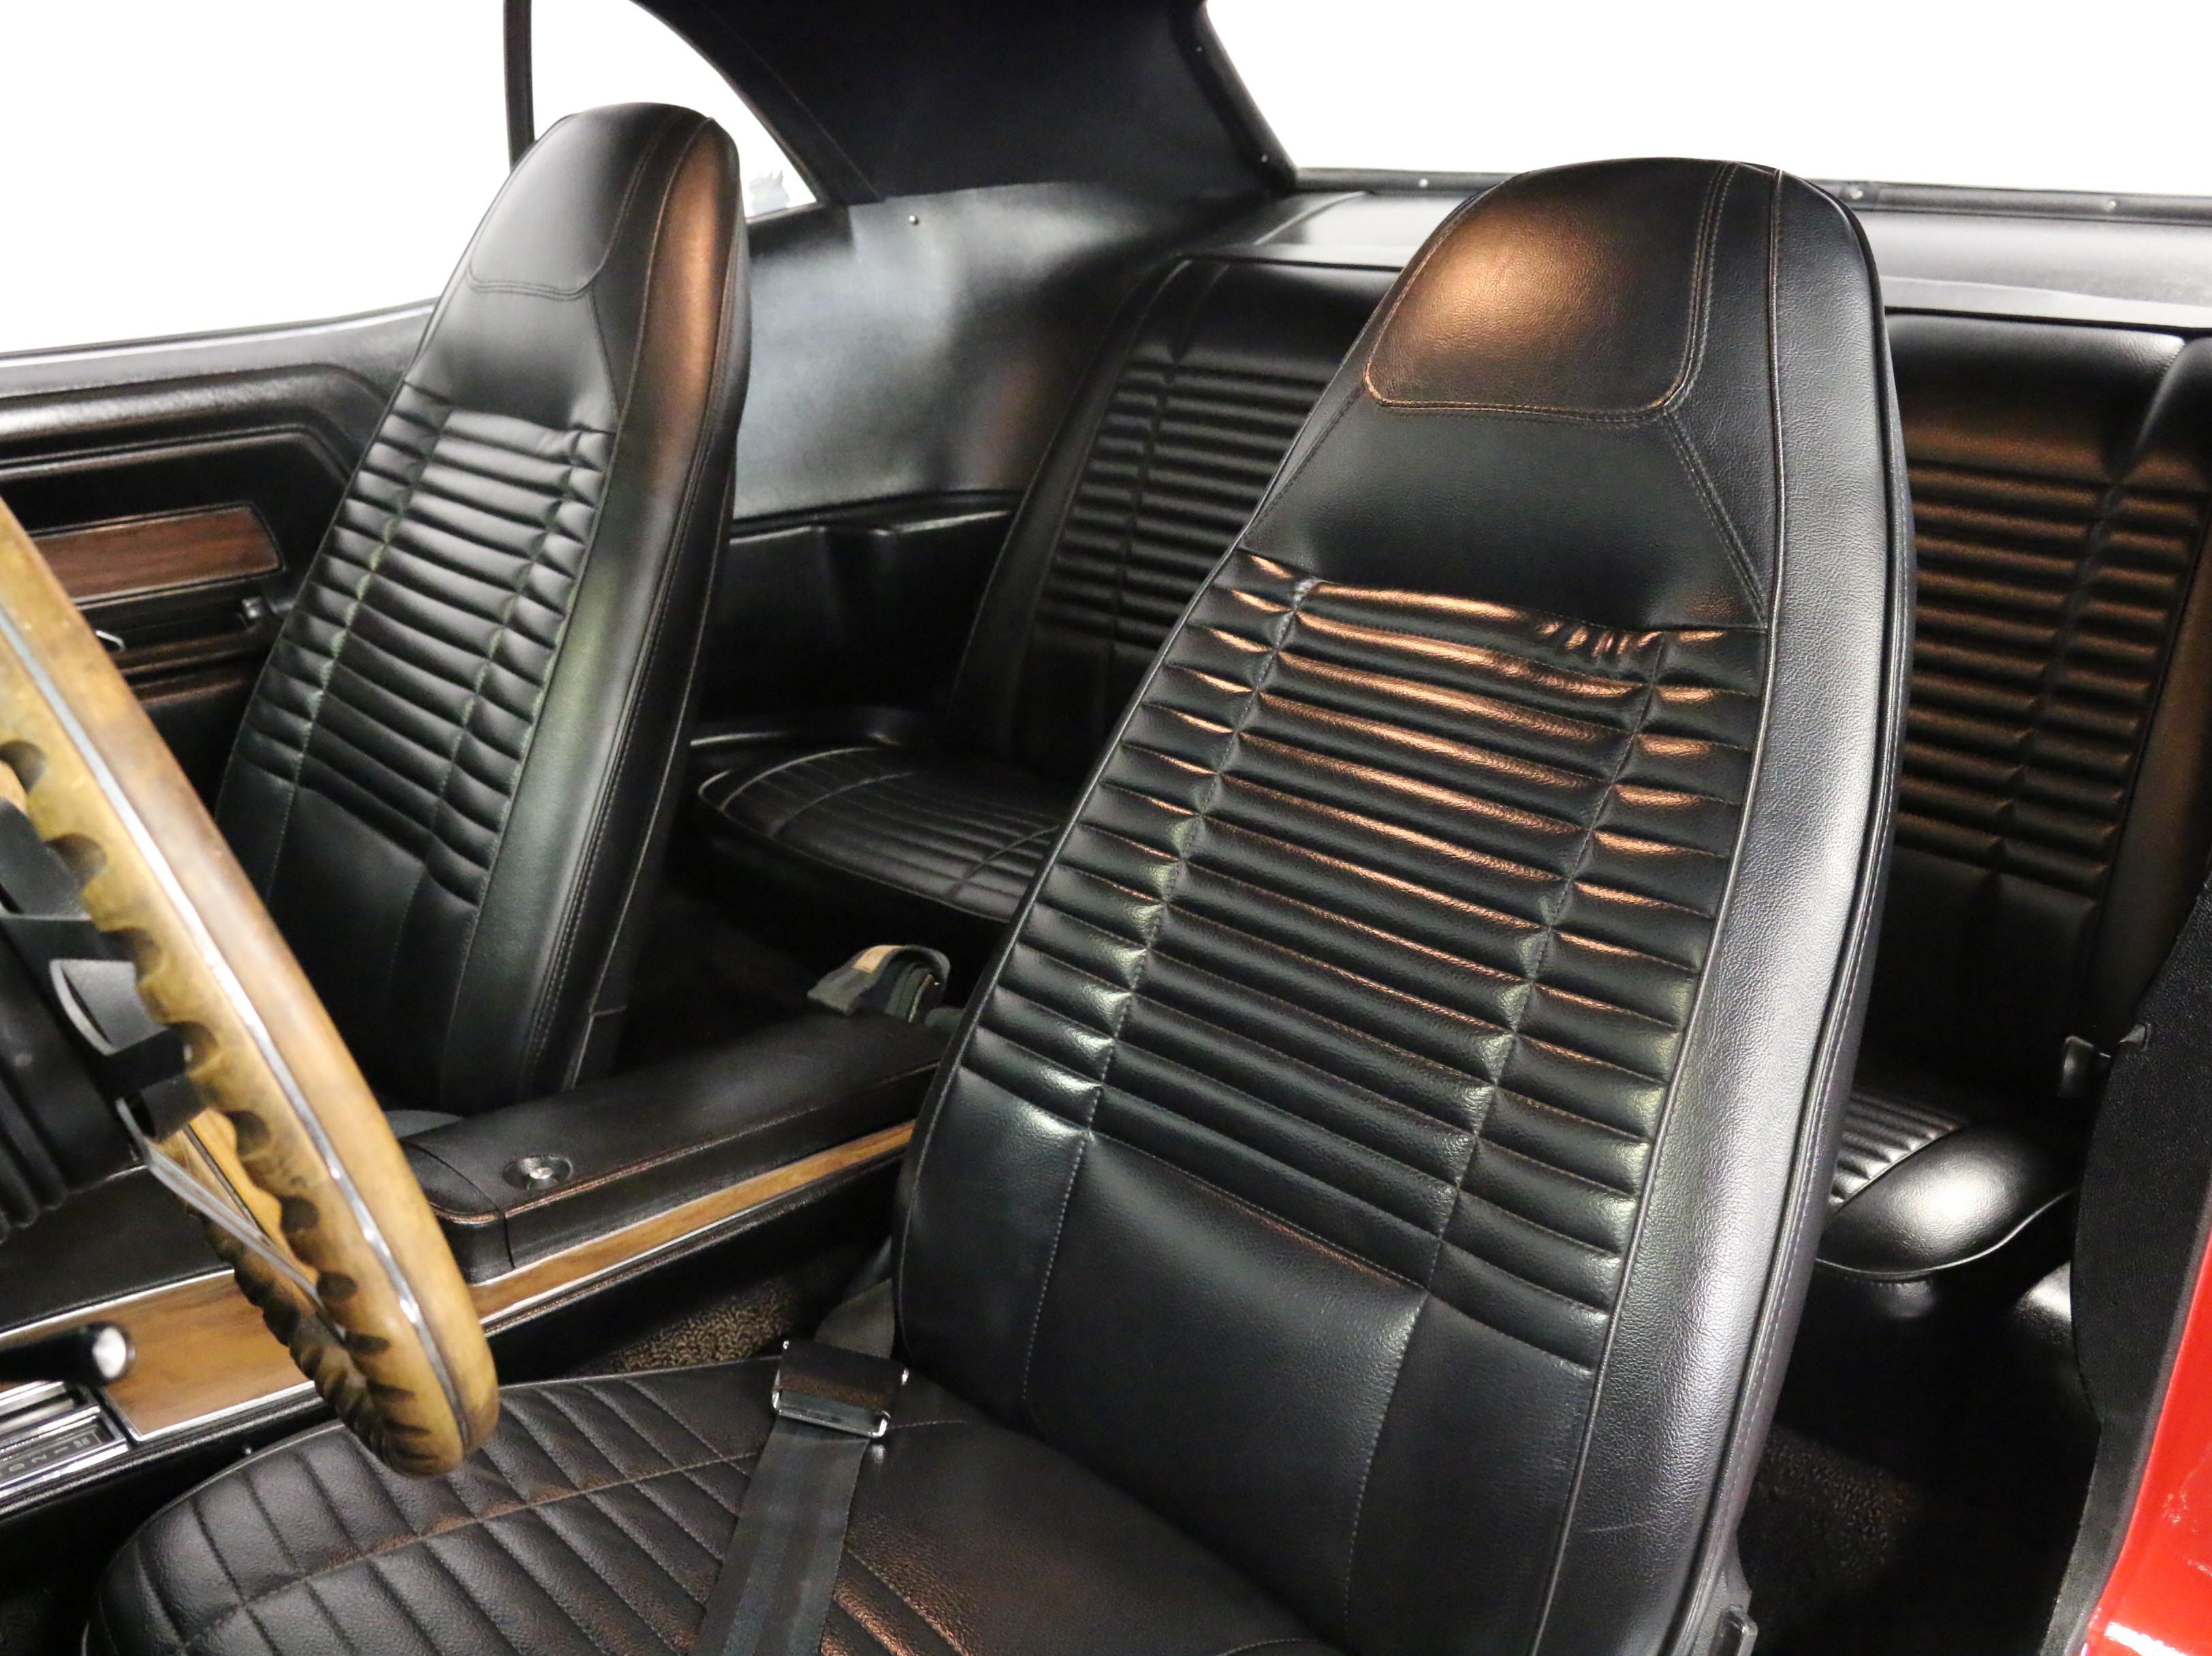 2487-DFW | 1970 Dodge Challenger T/A Six-Pack | Streetside Classics